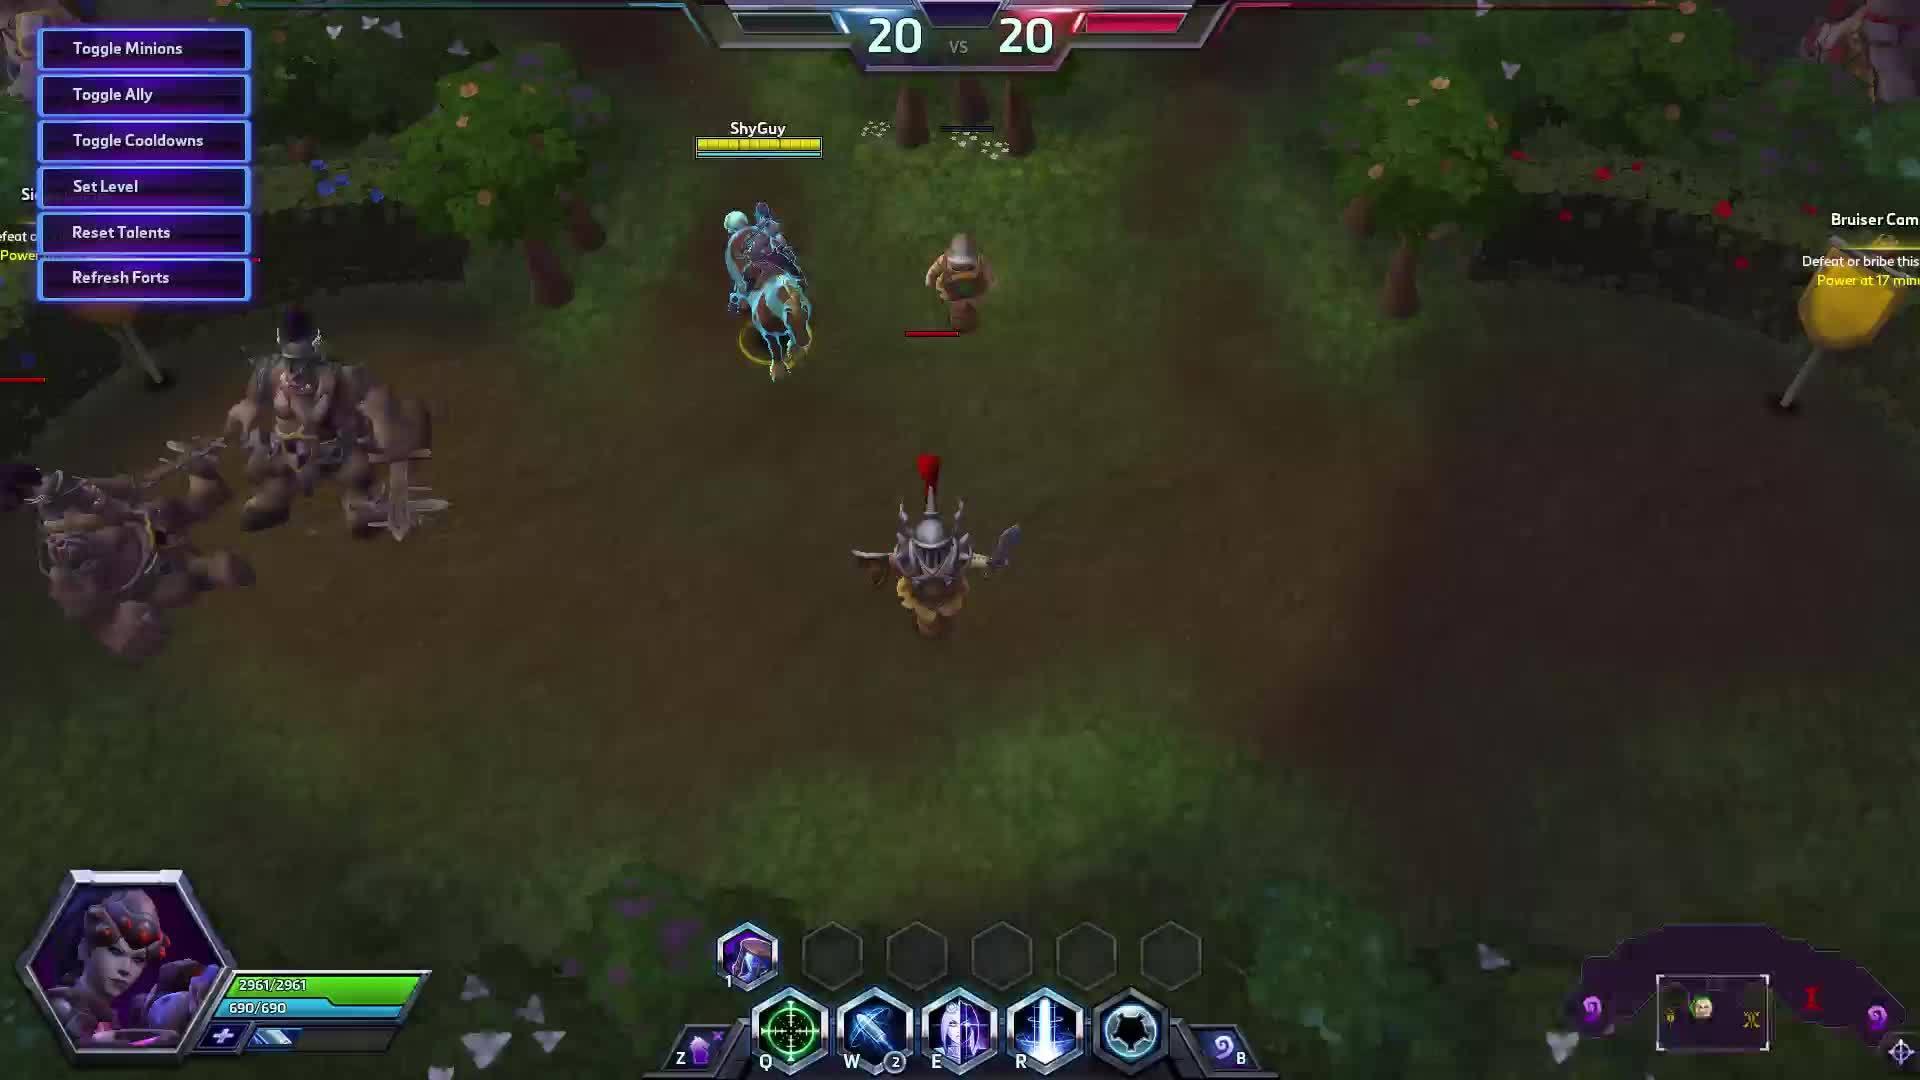 heroesofthestorm, Nova Precision Strike Rewind GIFs